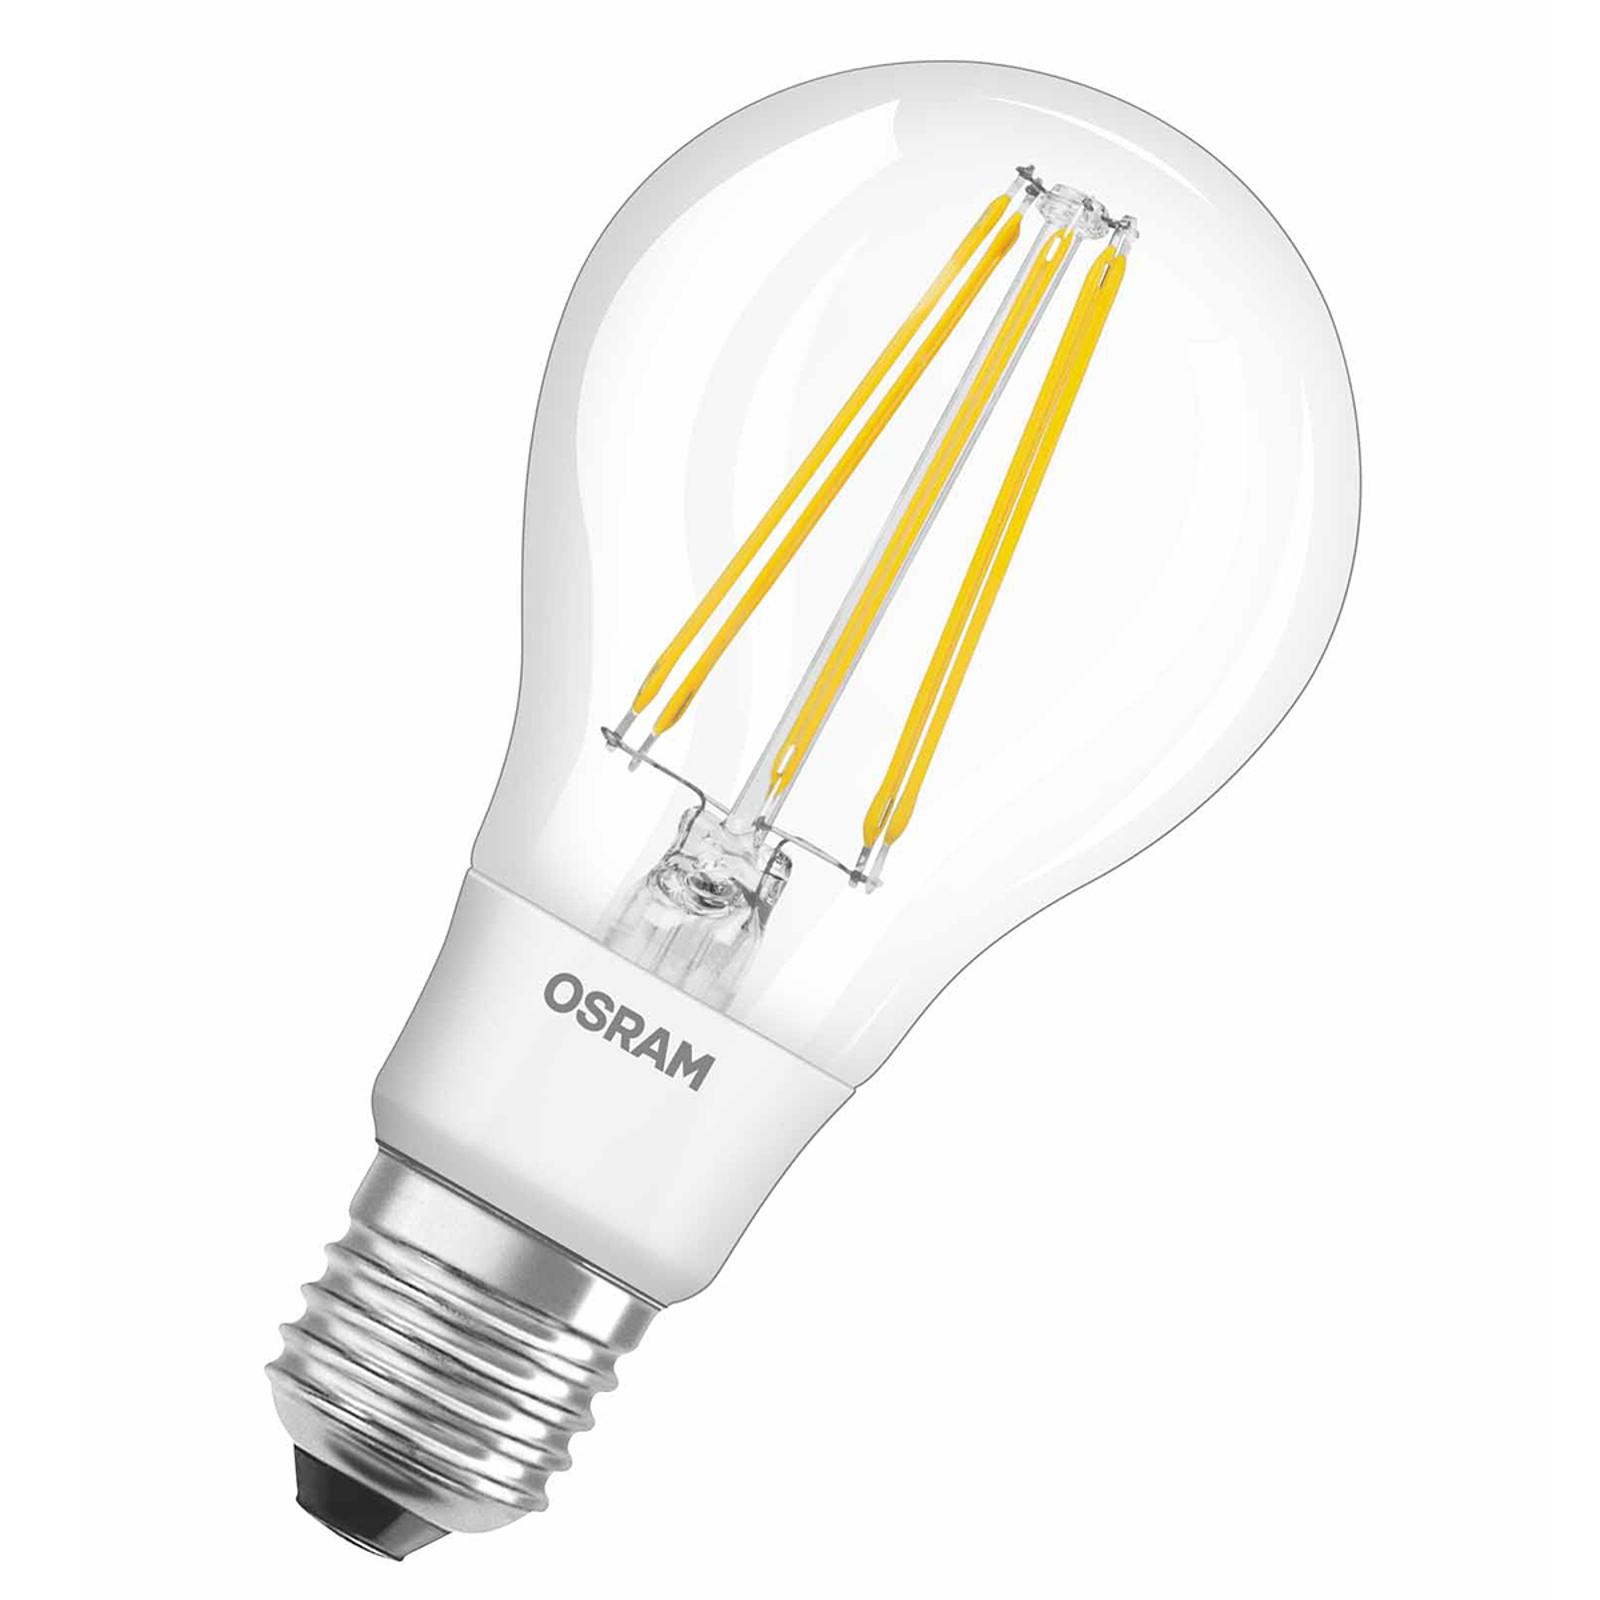 E27 11W 827 LED lamp, Retrofit